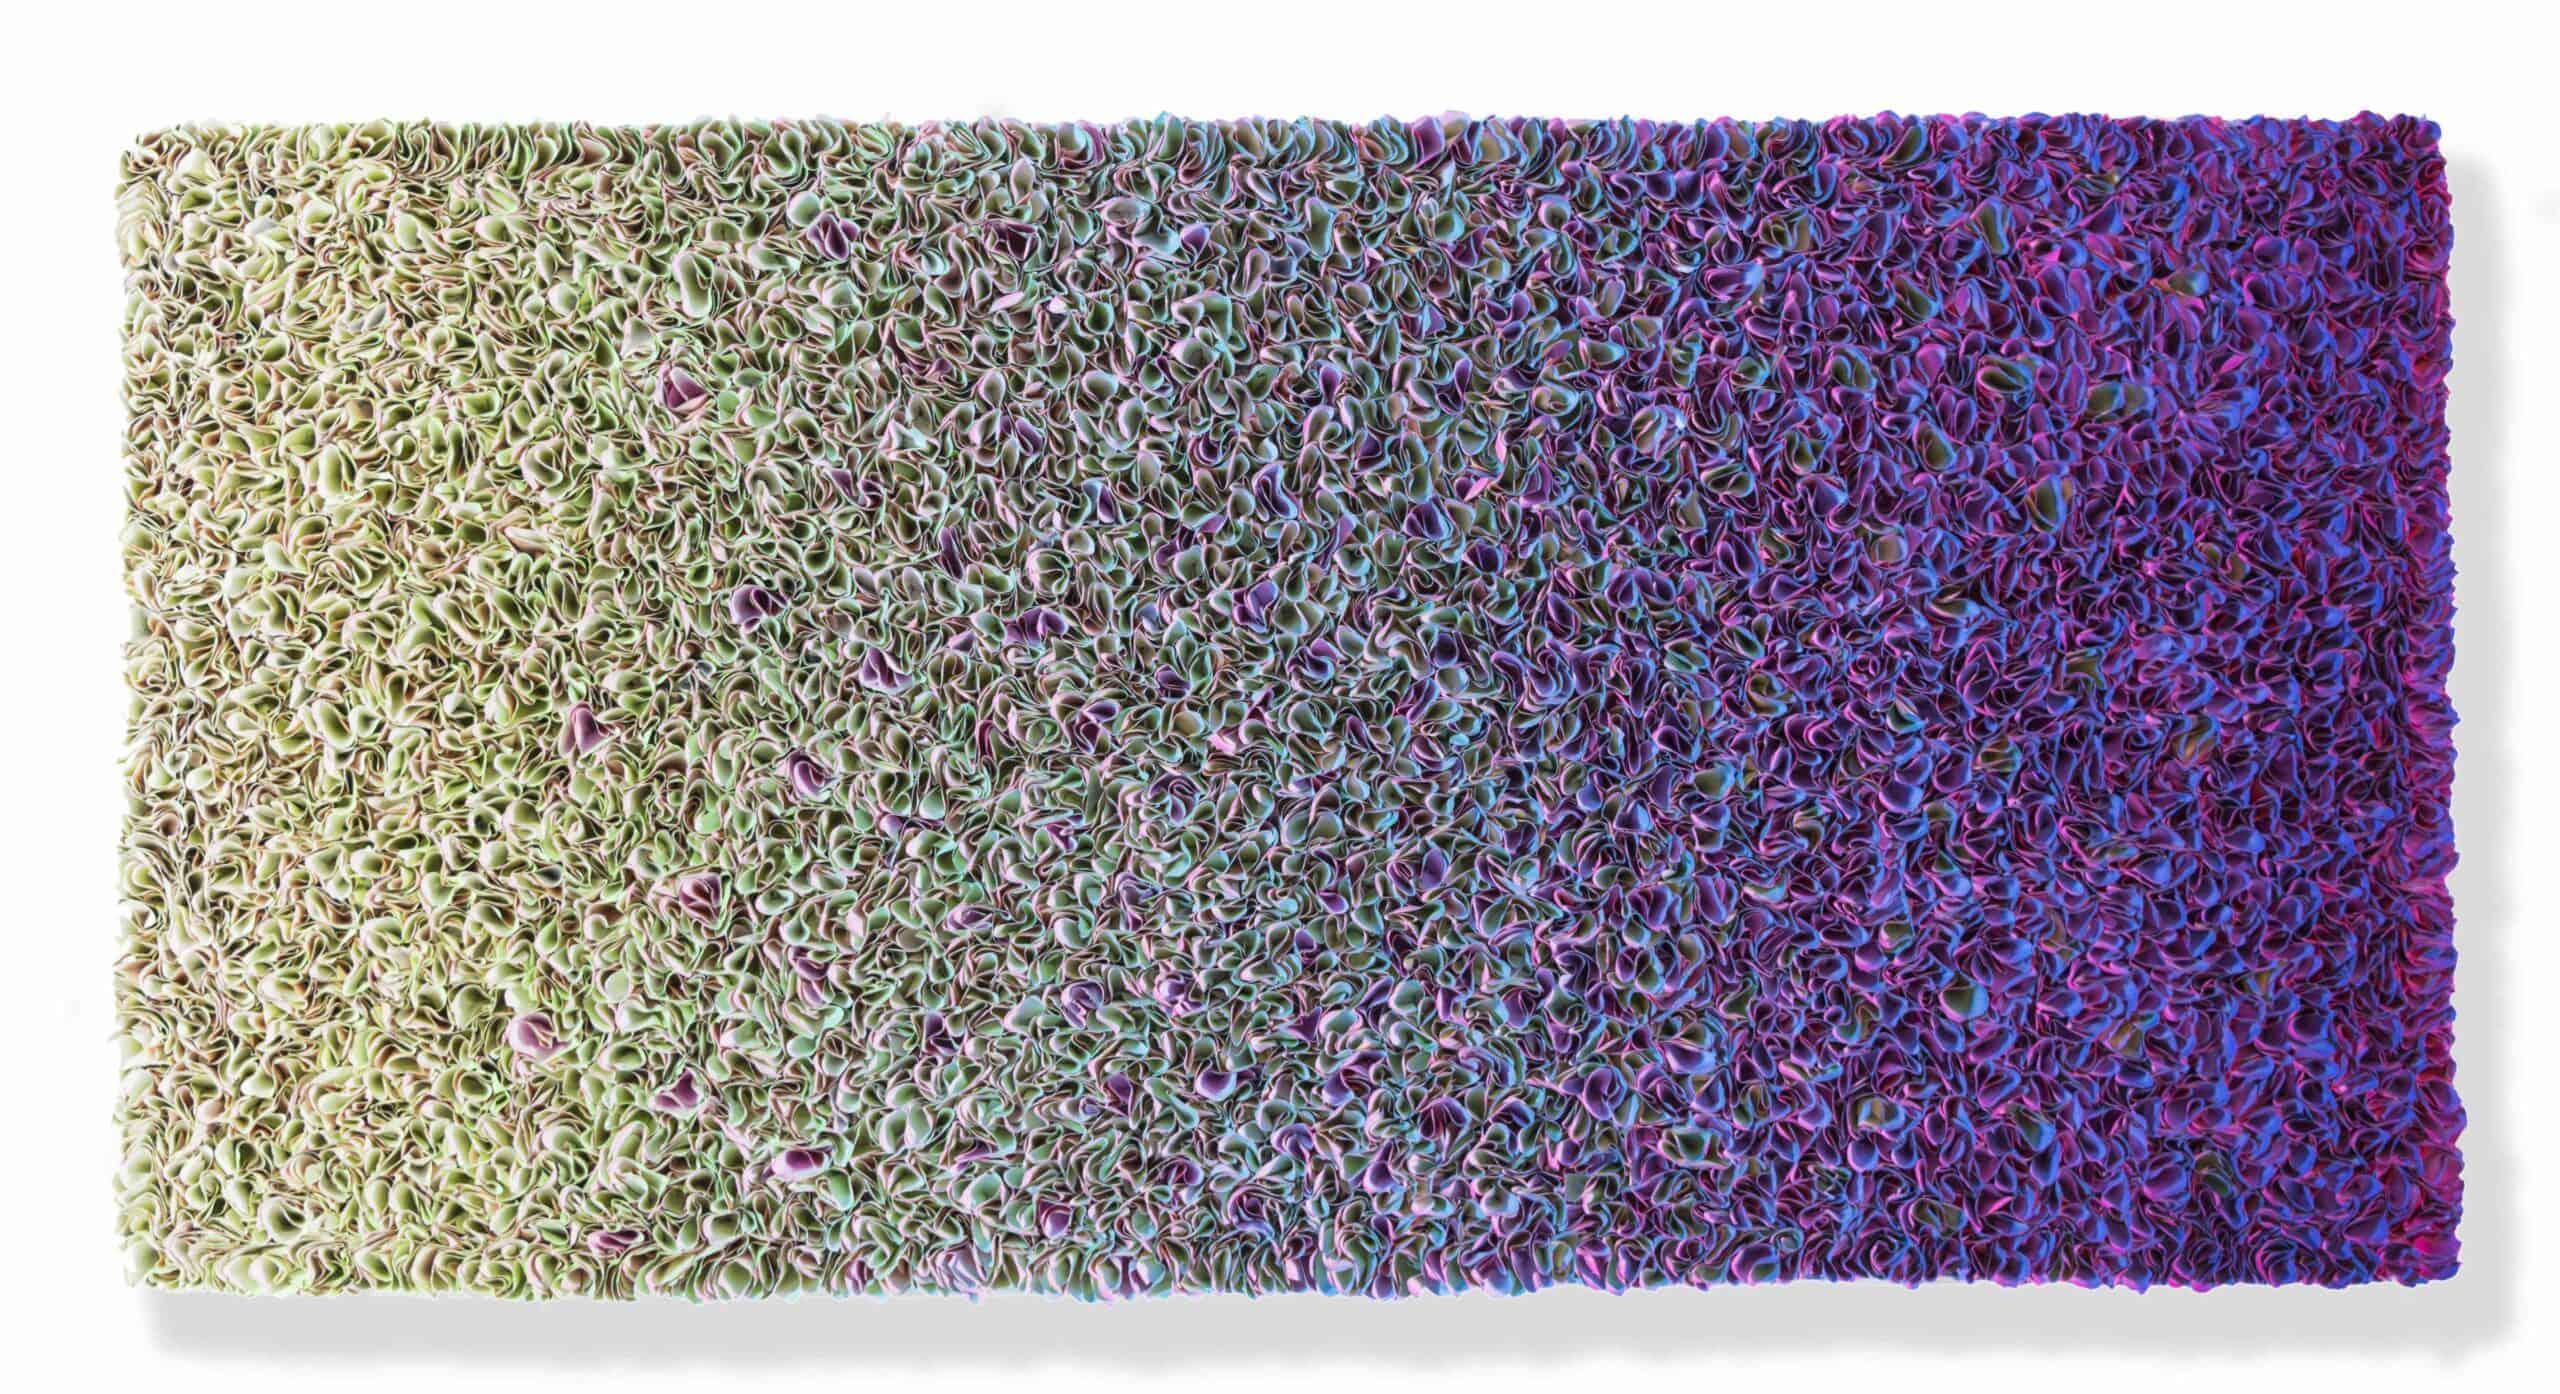 Zhuang Hong Yi - Flowerbed Colorchange (2019), 75x150cm - Courtesy SmithDavidson Gallery